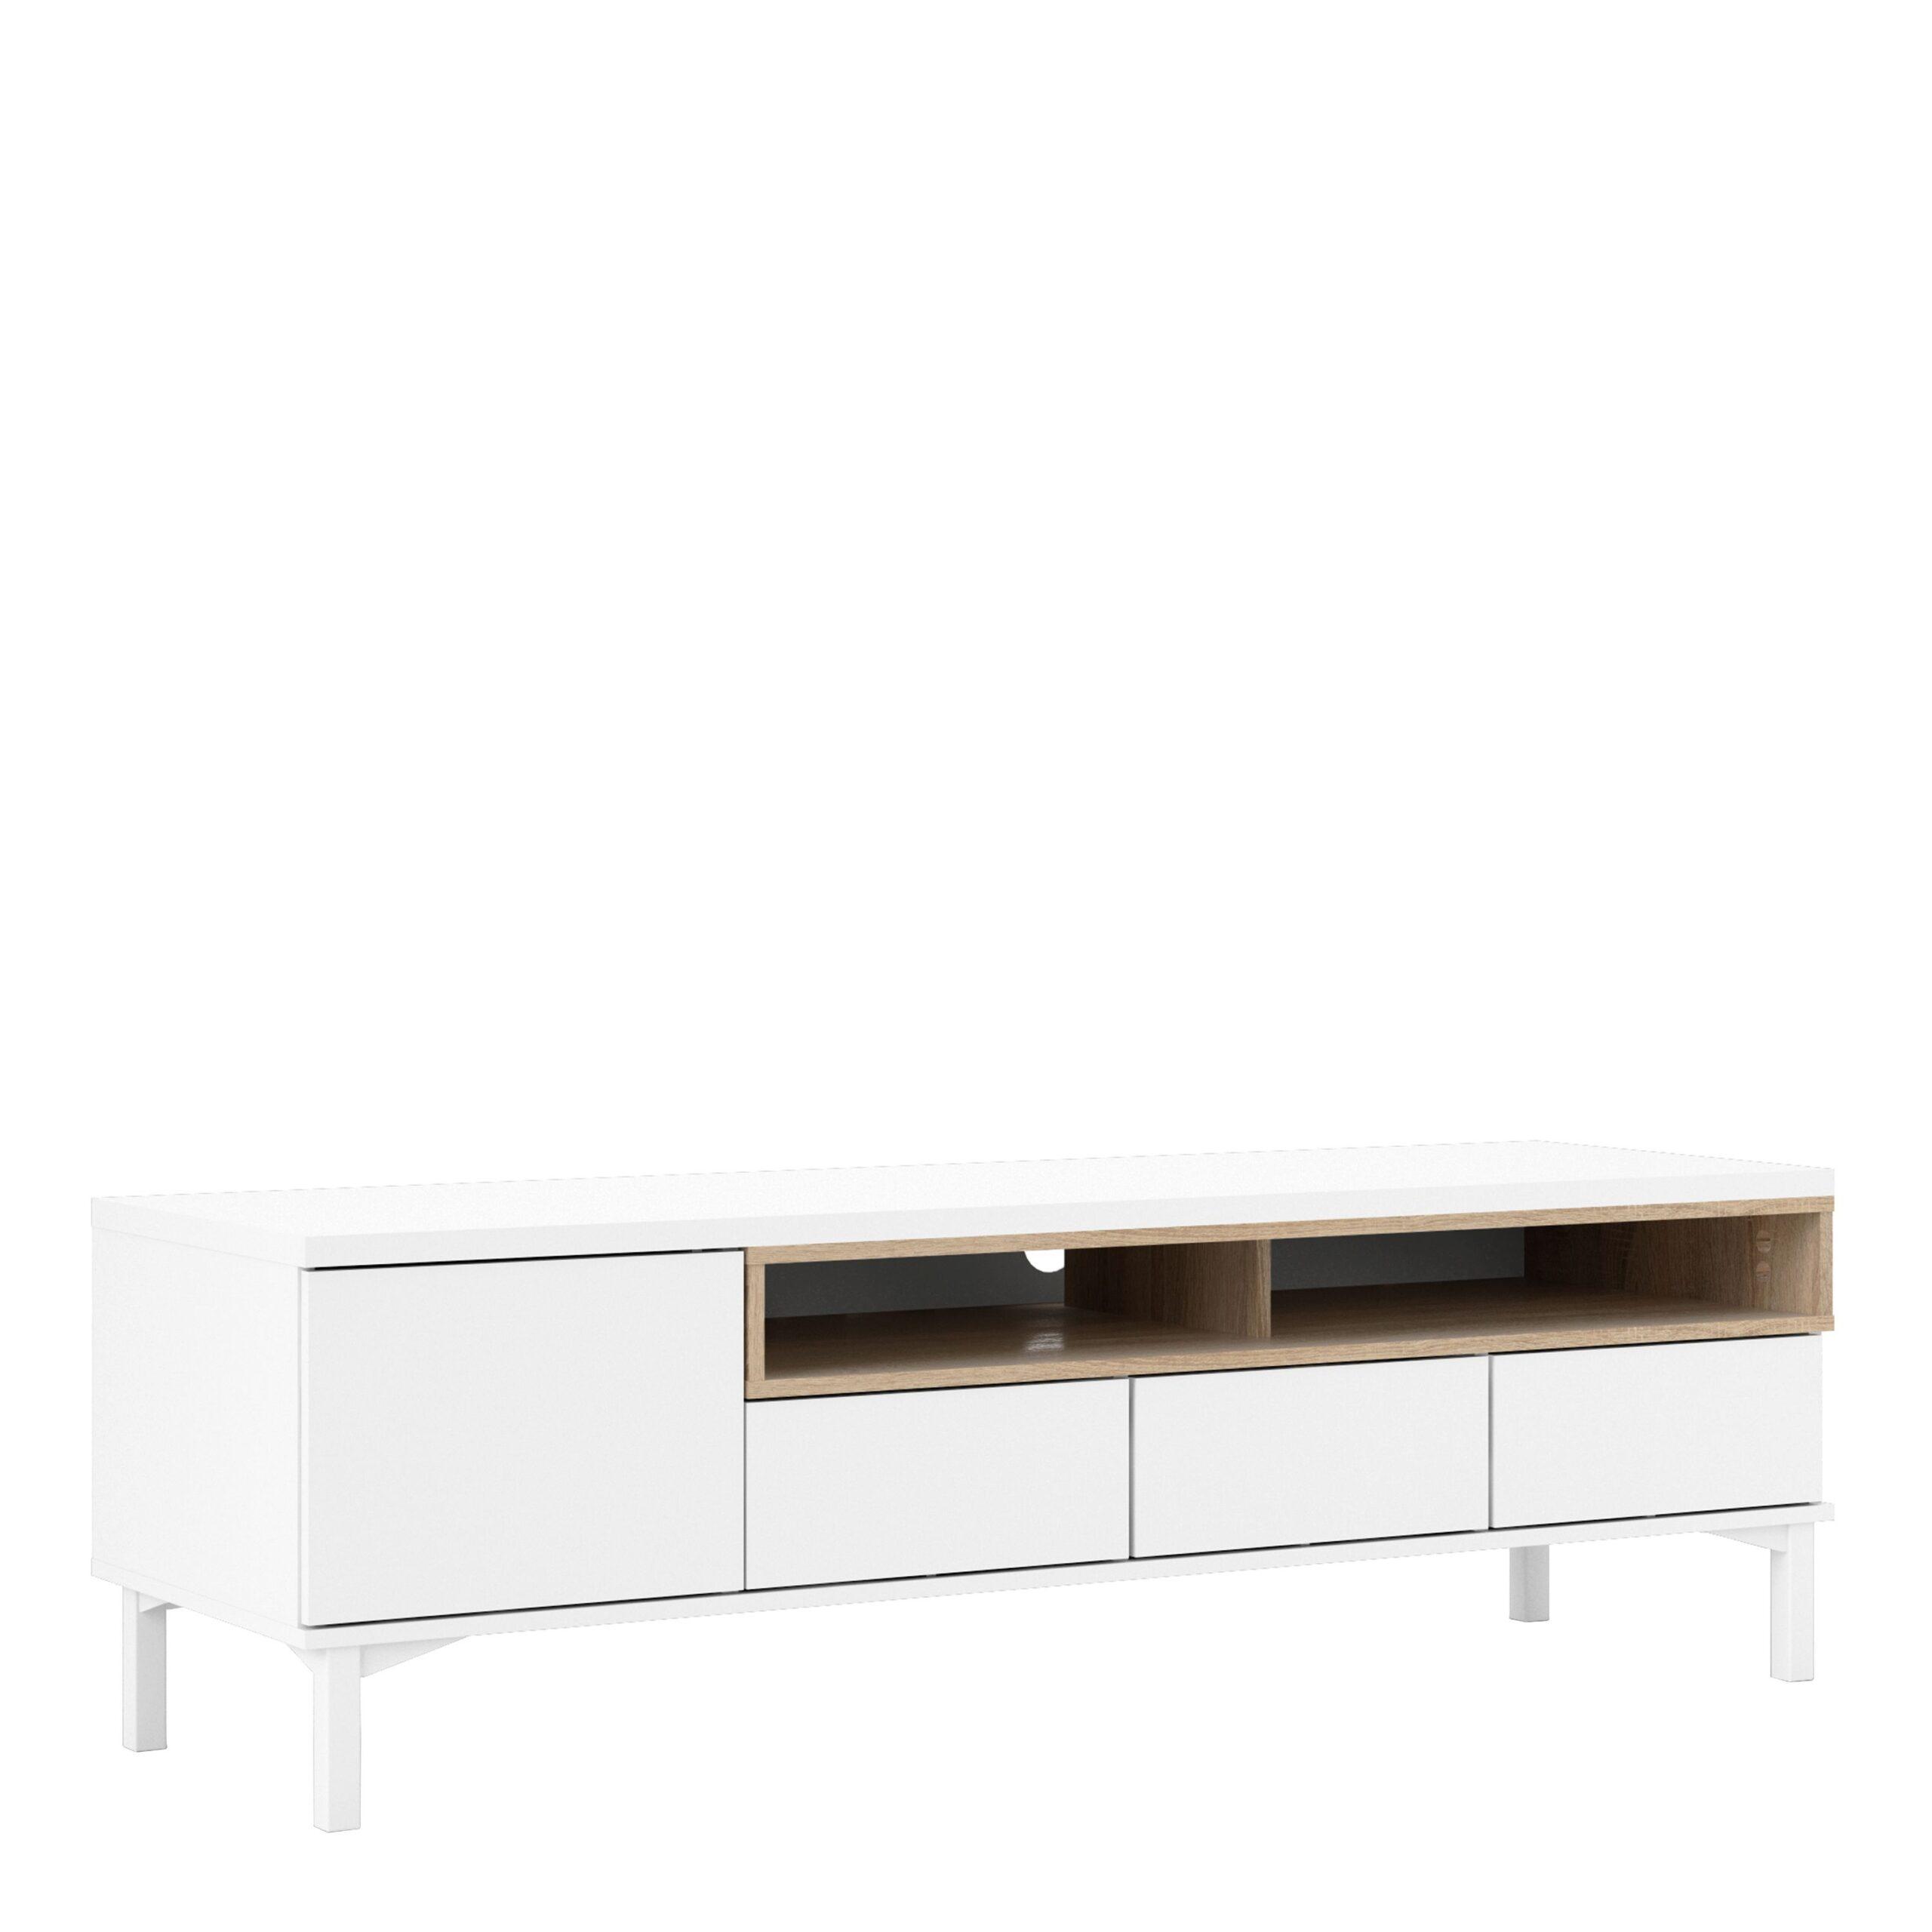 Ramen TV Units 3 Drawers 1 Door in White and Oak